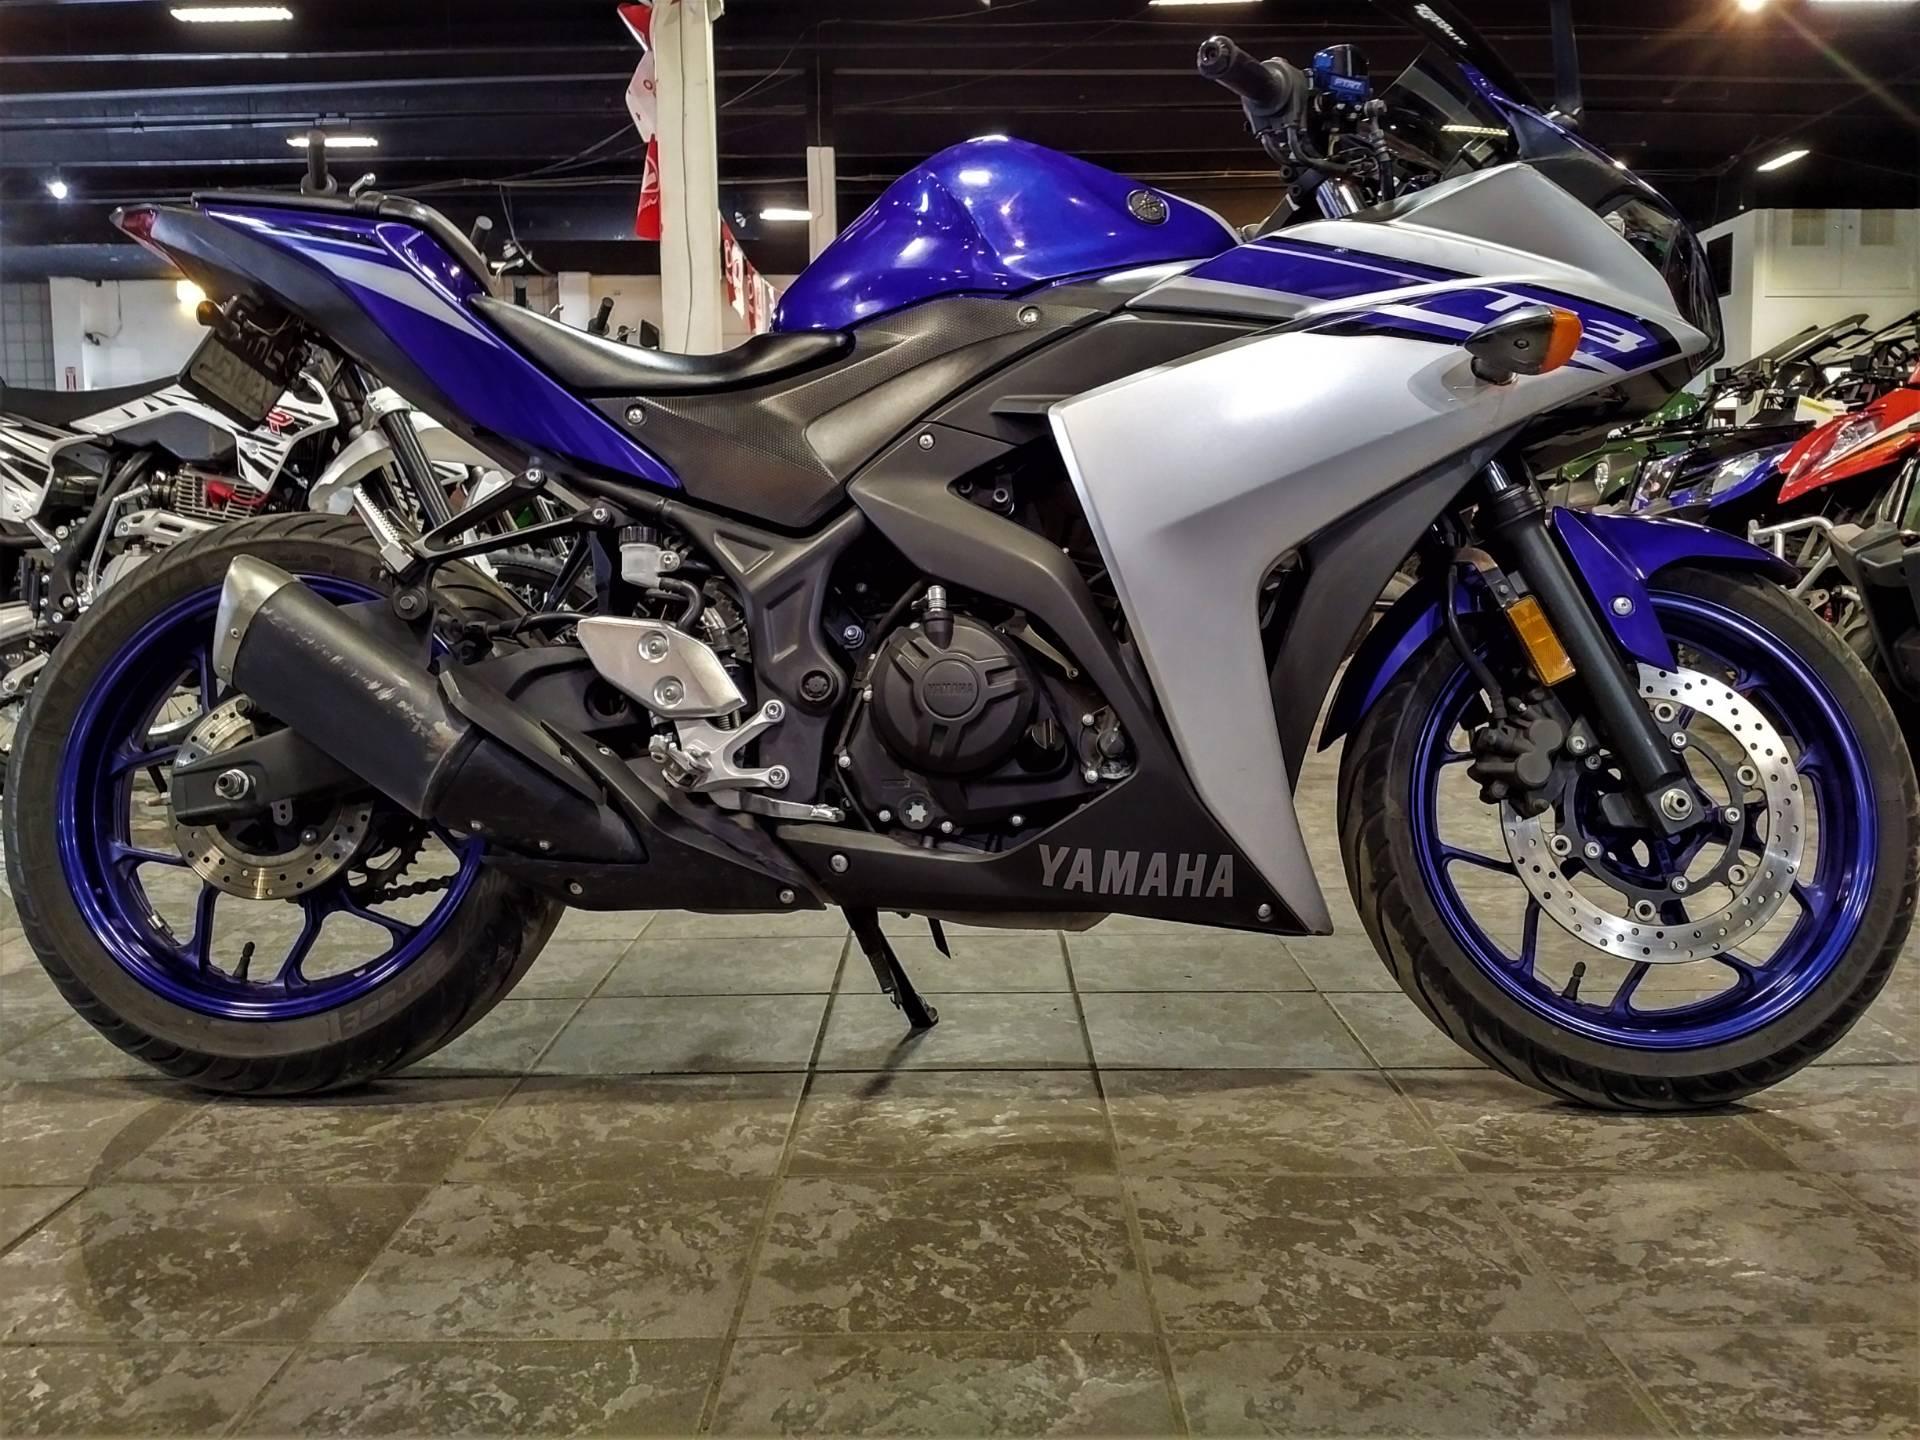 2016 Yamaha YZF-R3 for sale 93183